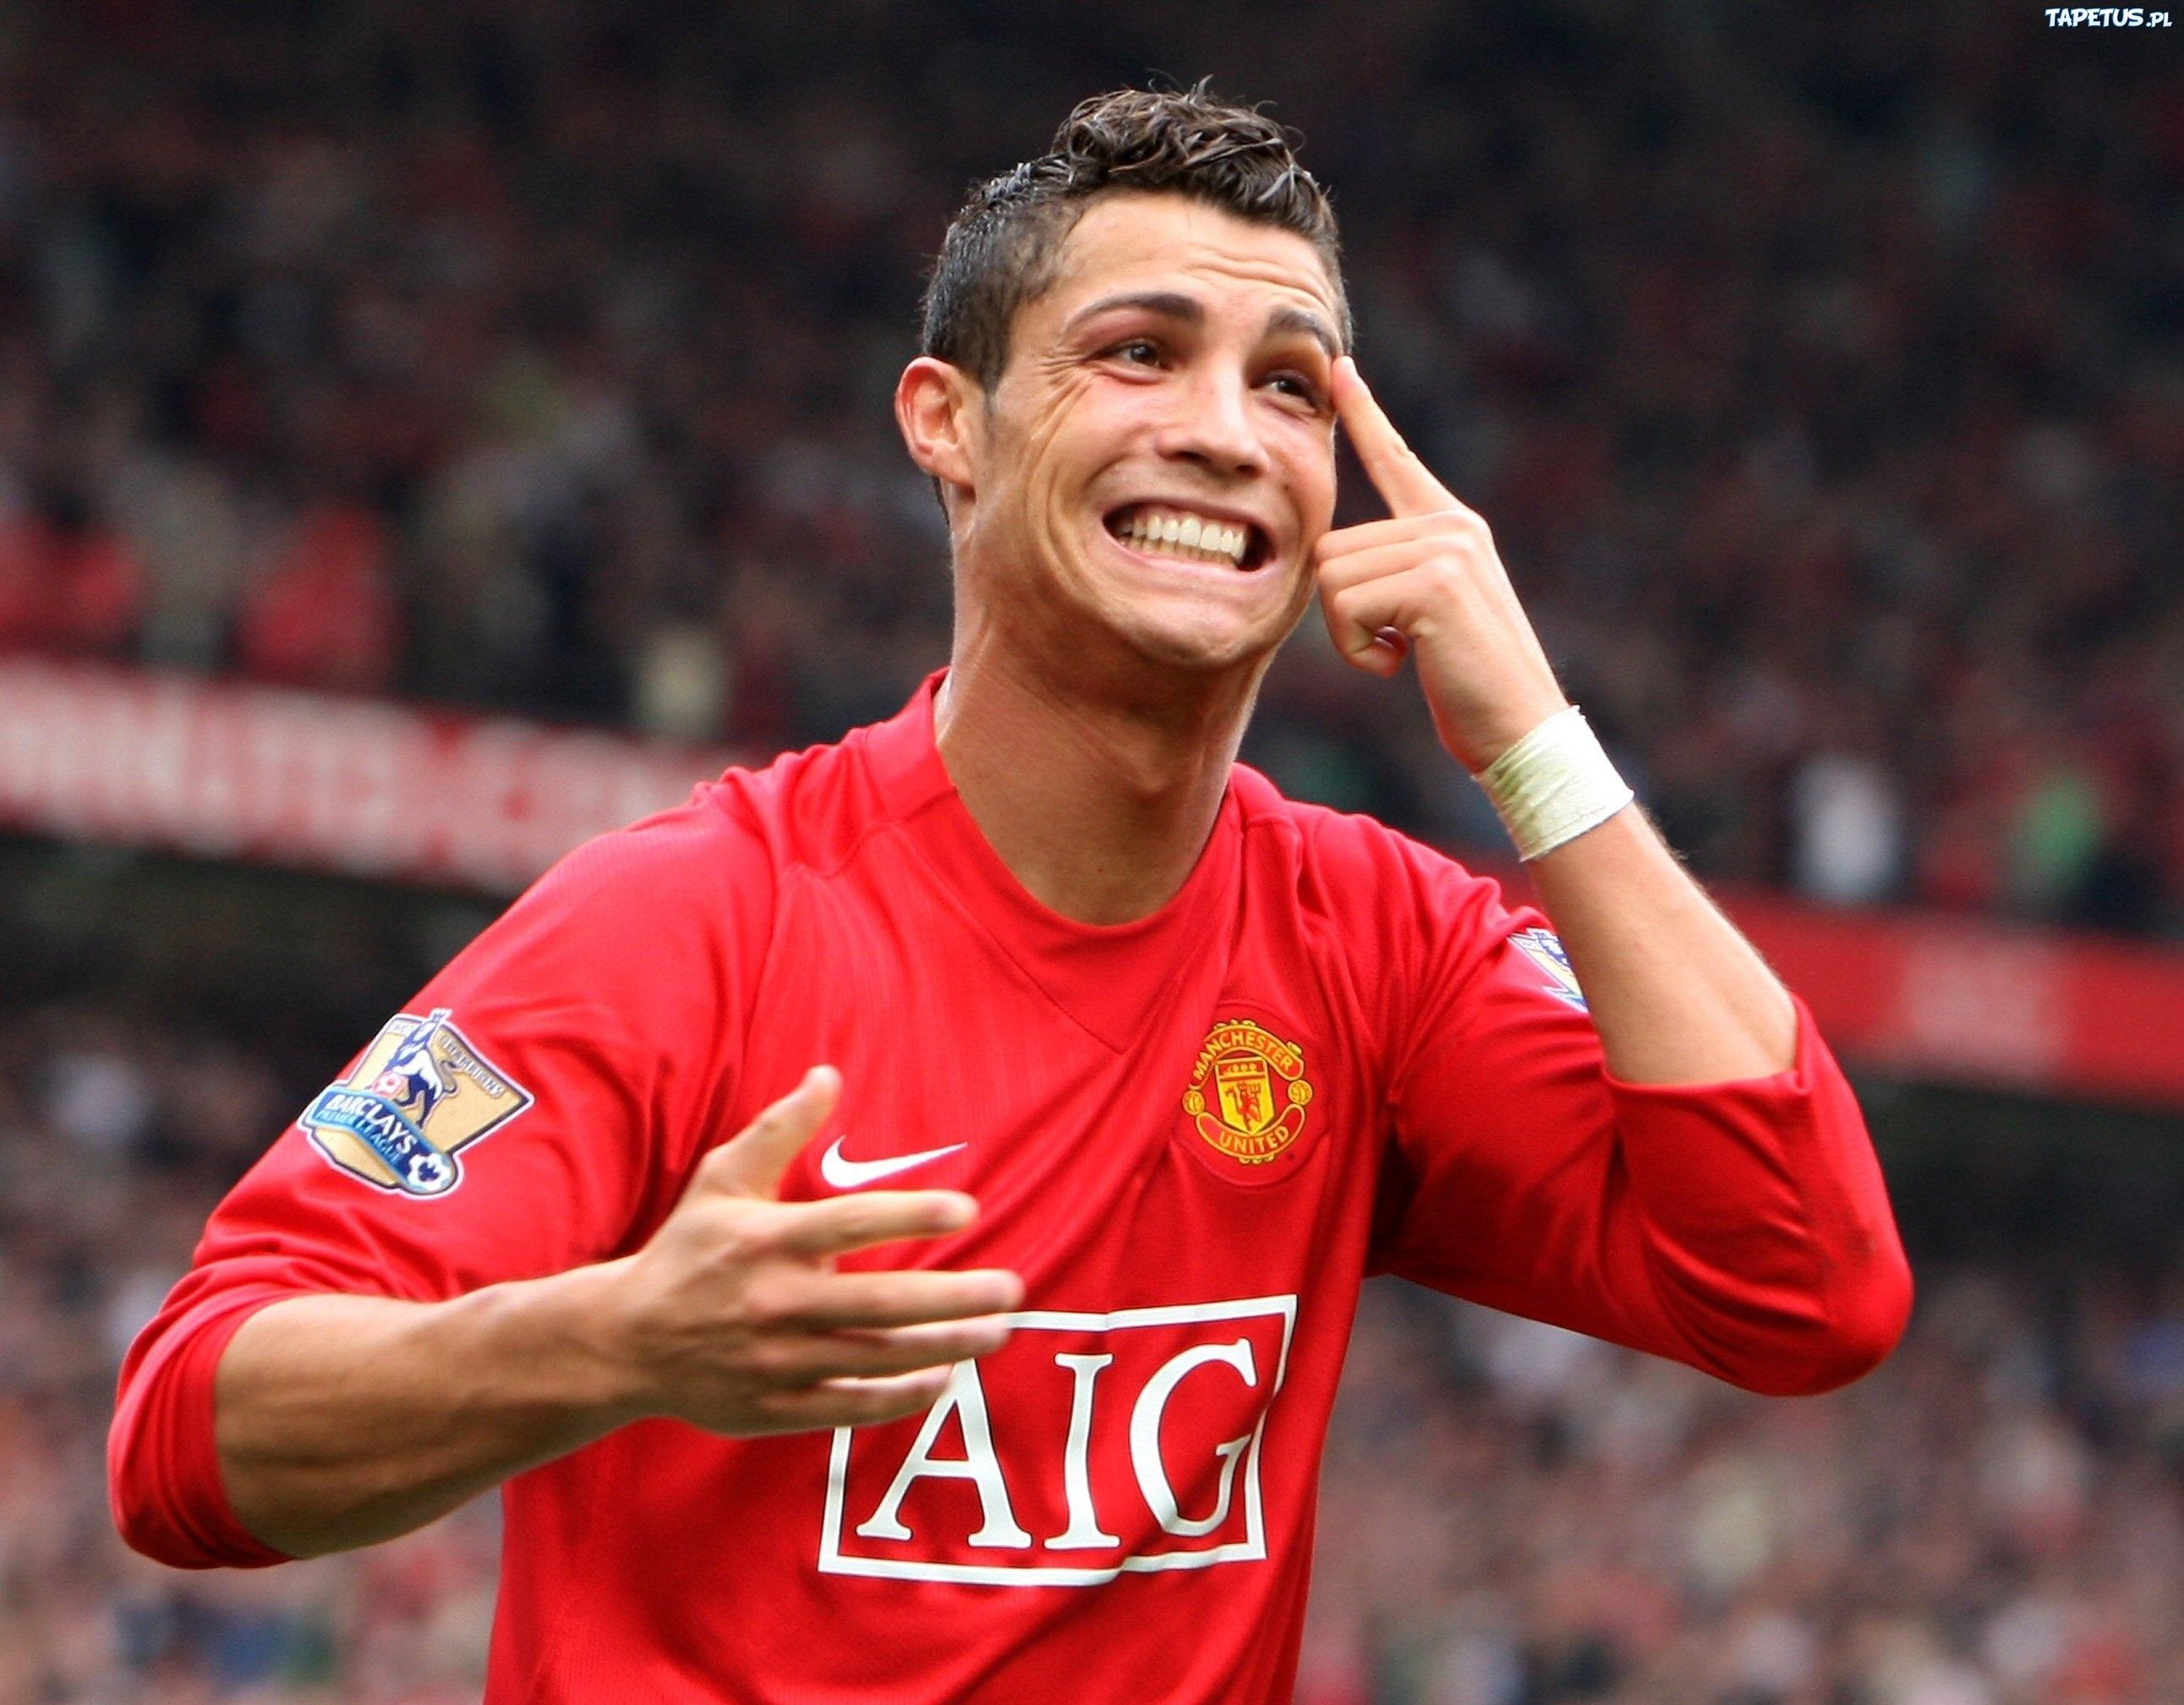 Image Result For Reklama Nike Z Cristiano Ronaldo